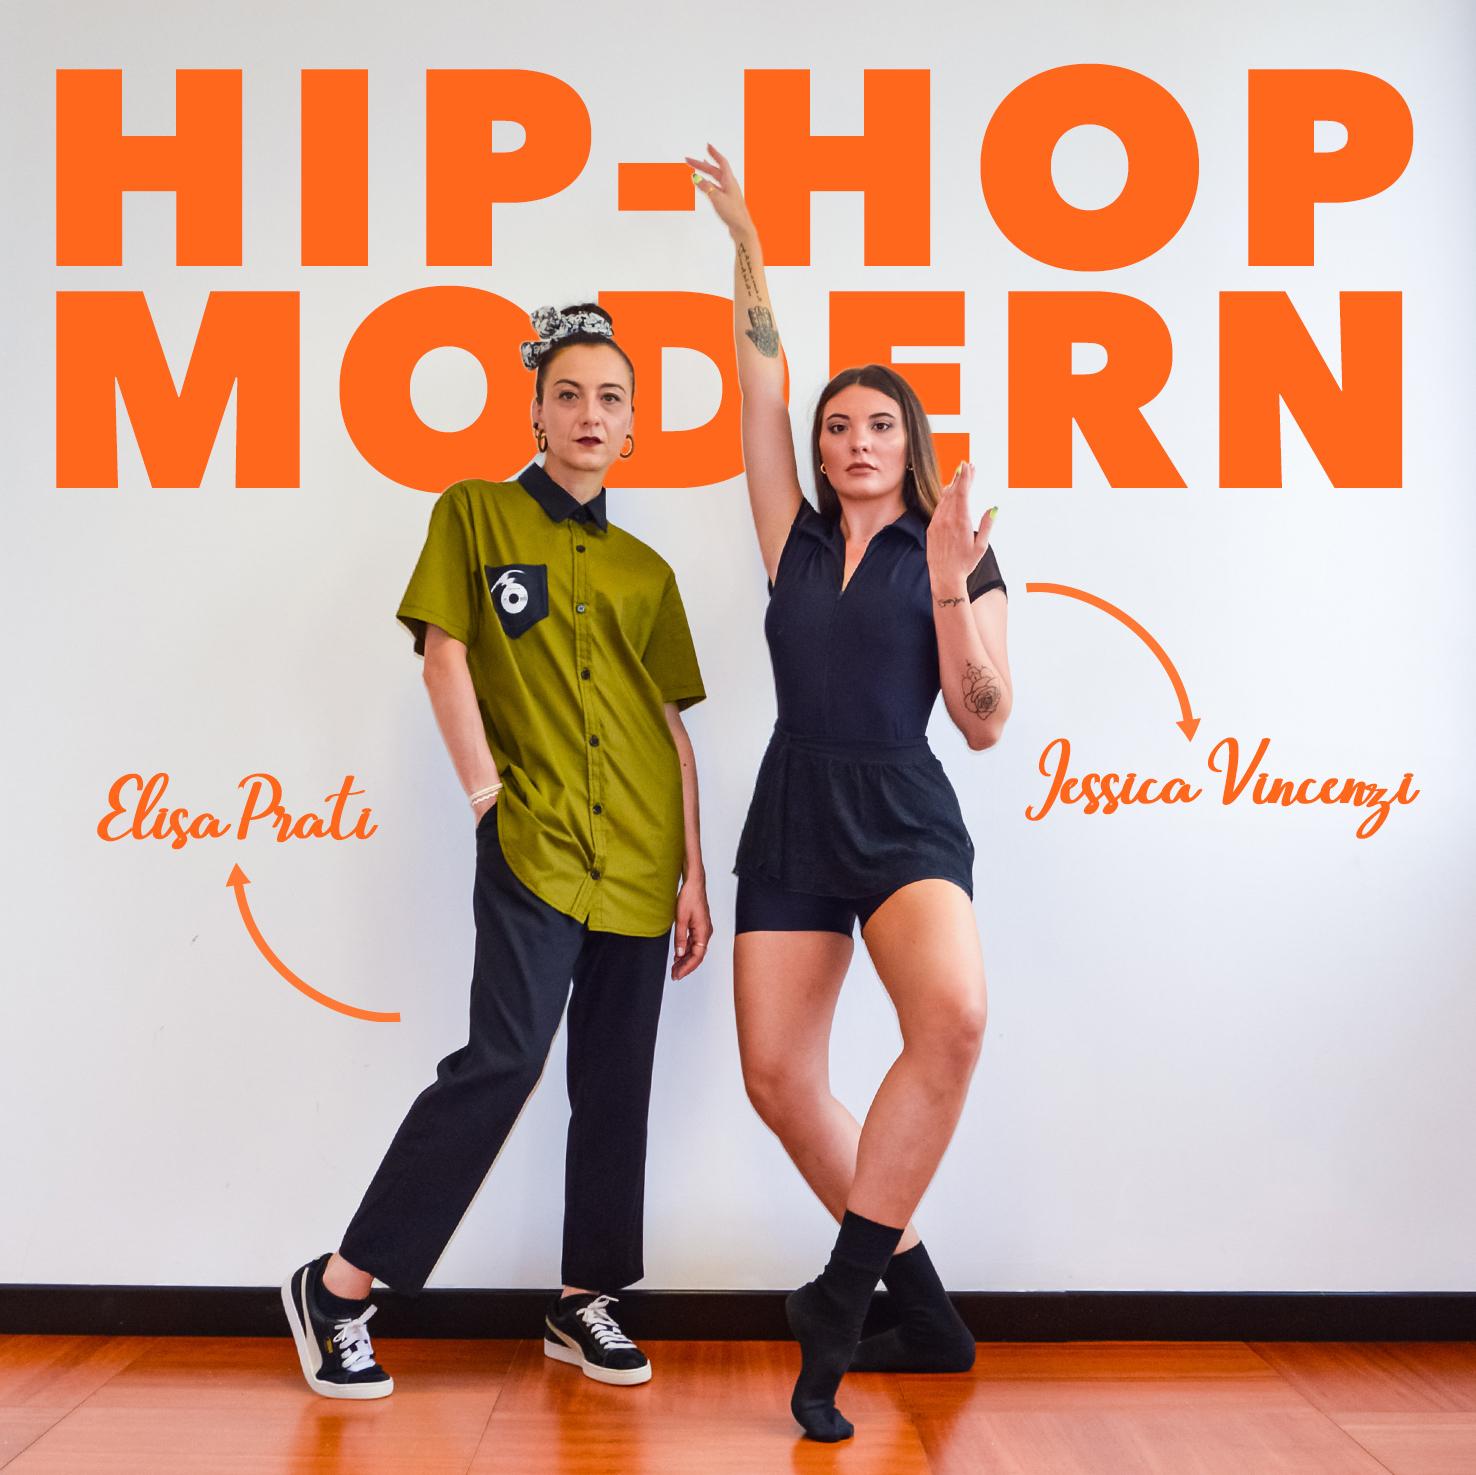 Corsi di Danza Moderna e Hip-Hop a Montecchia di Crosara - School of Art®